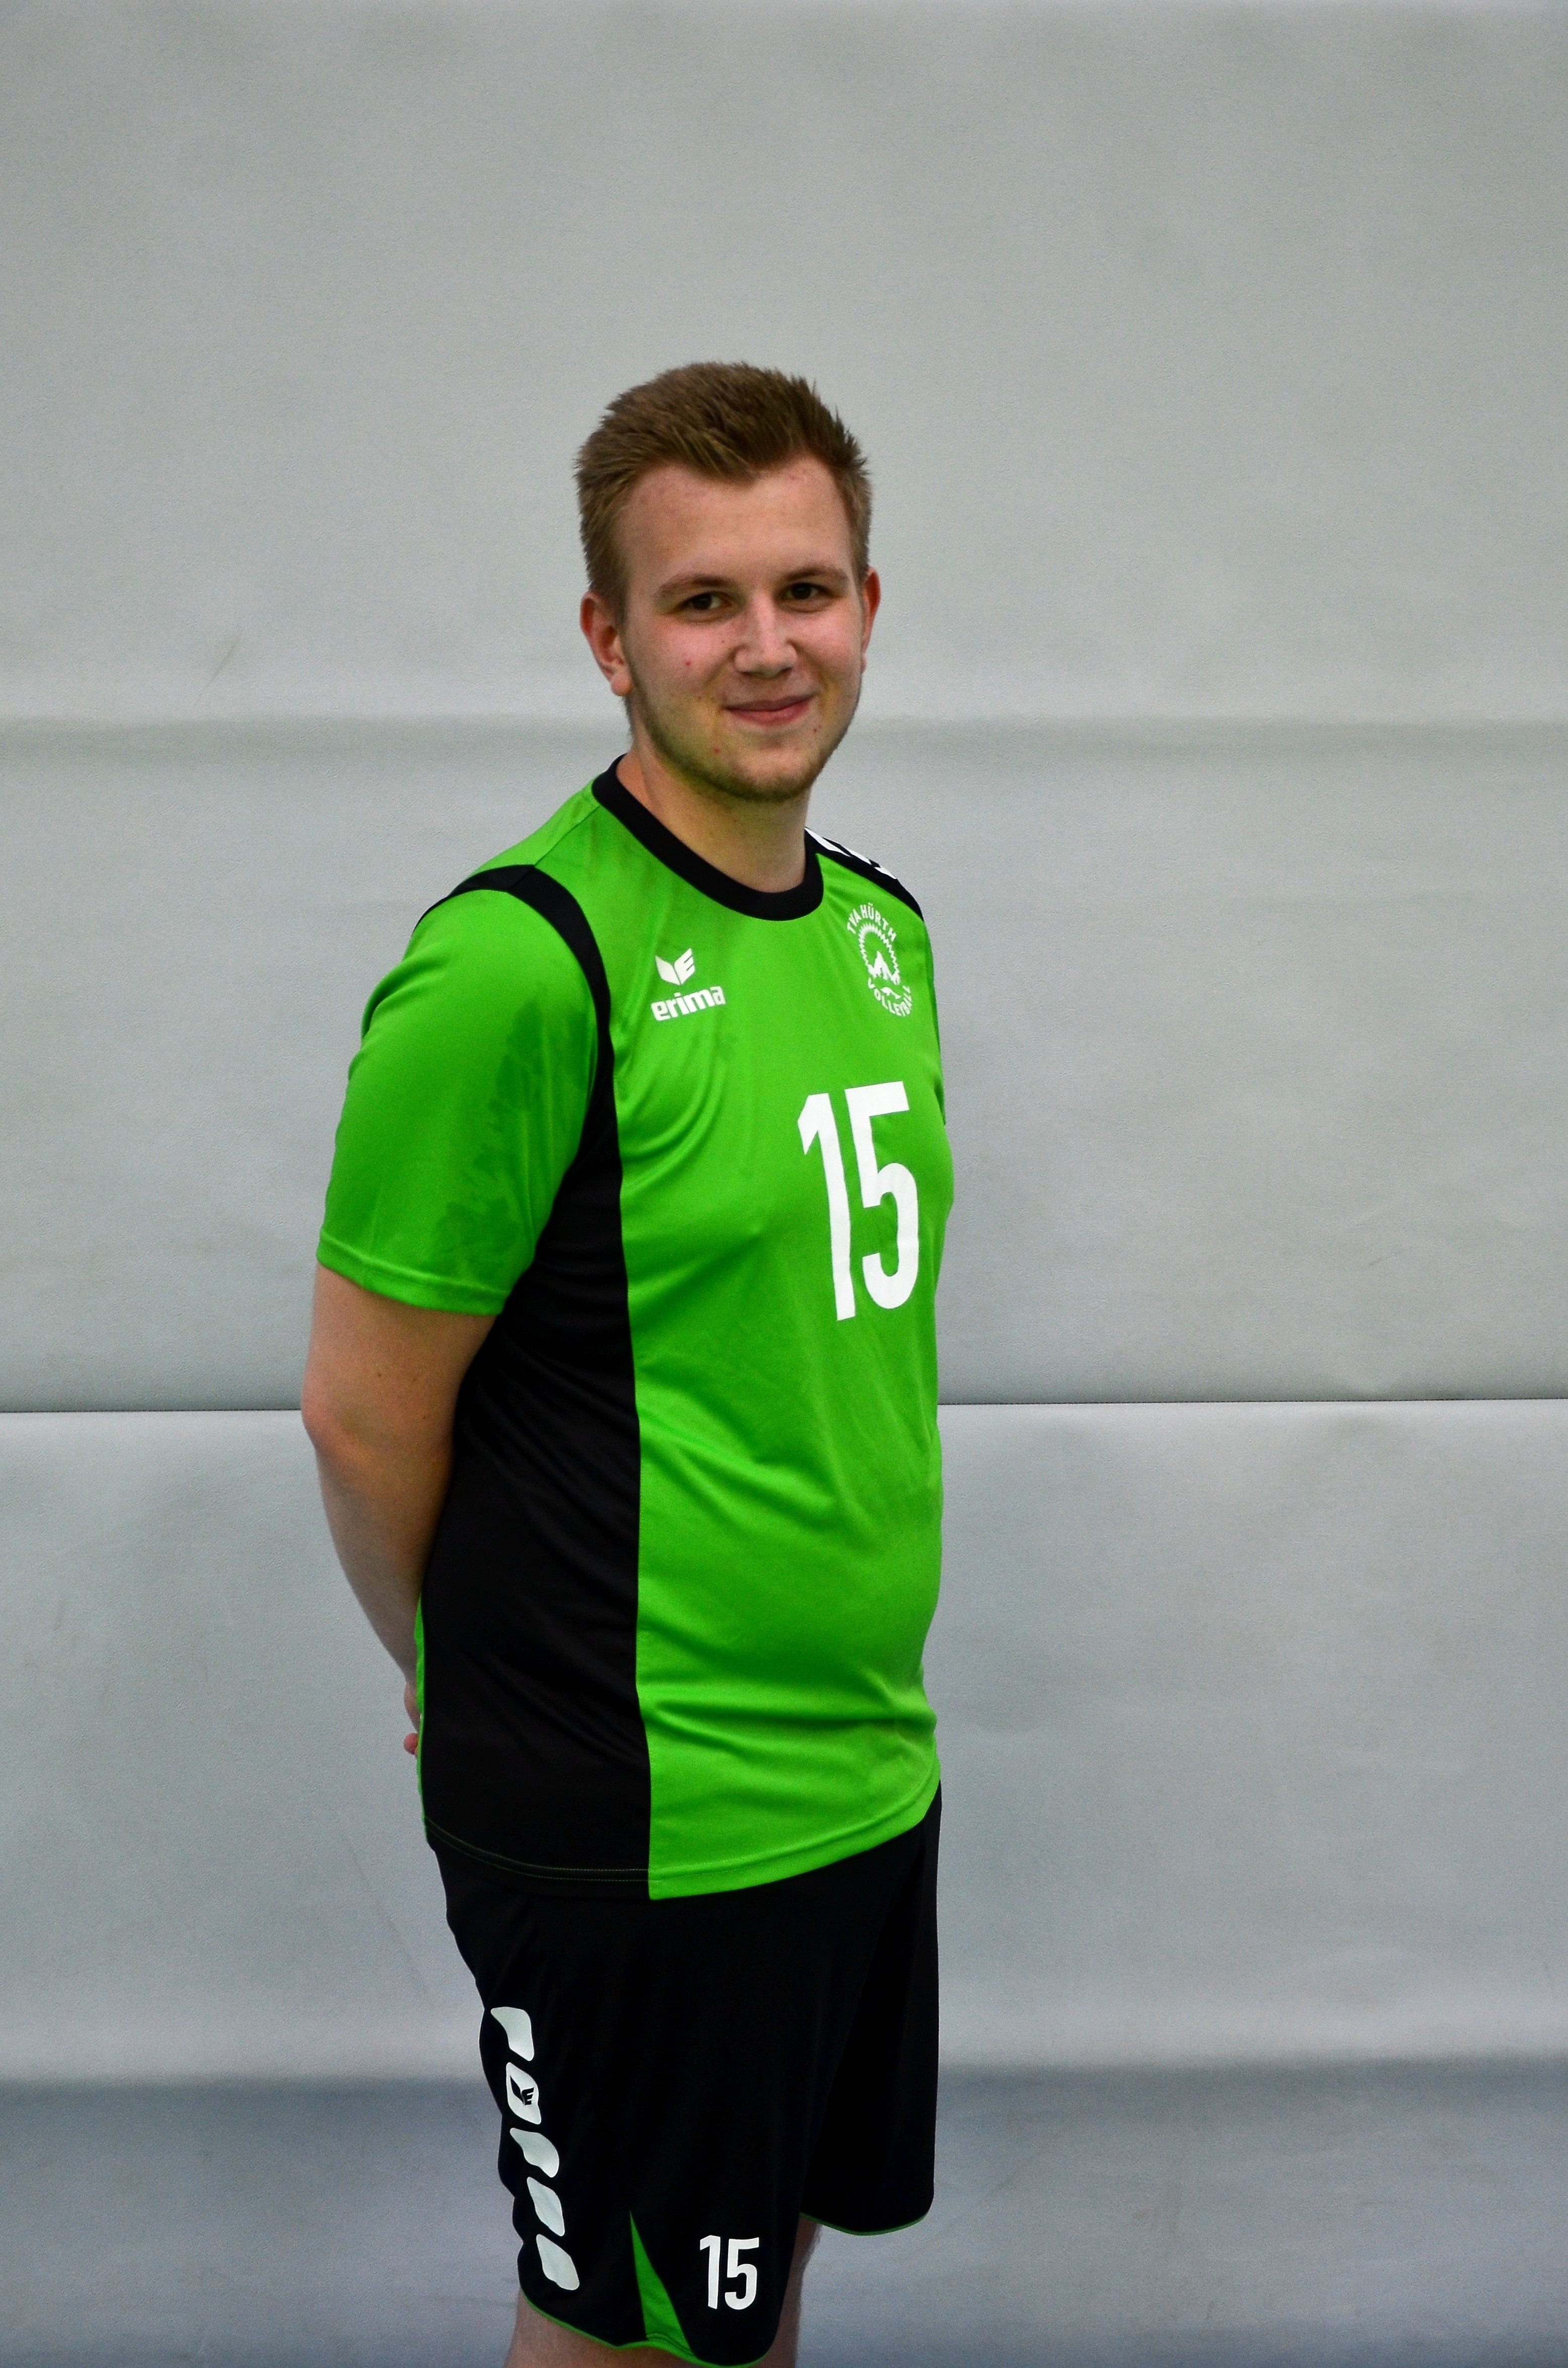 Patrick Lindenberg